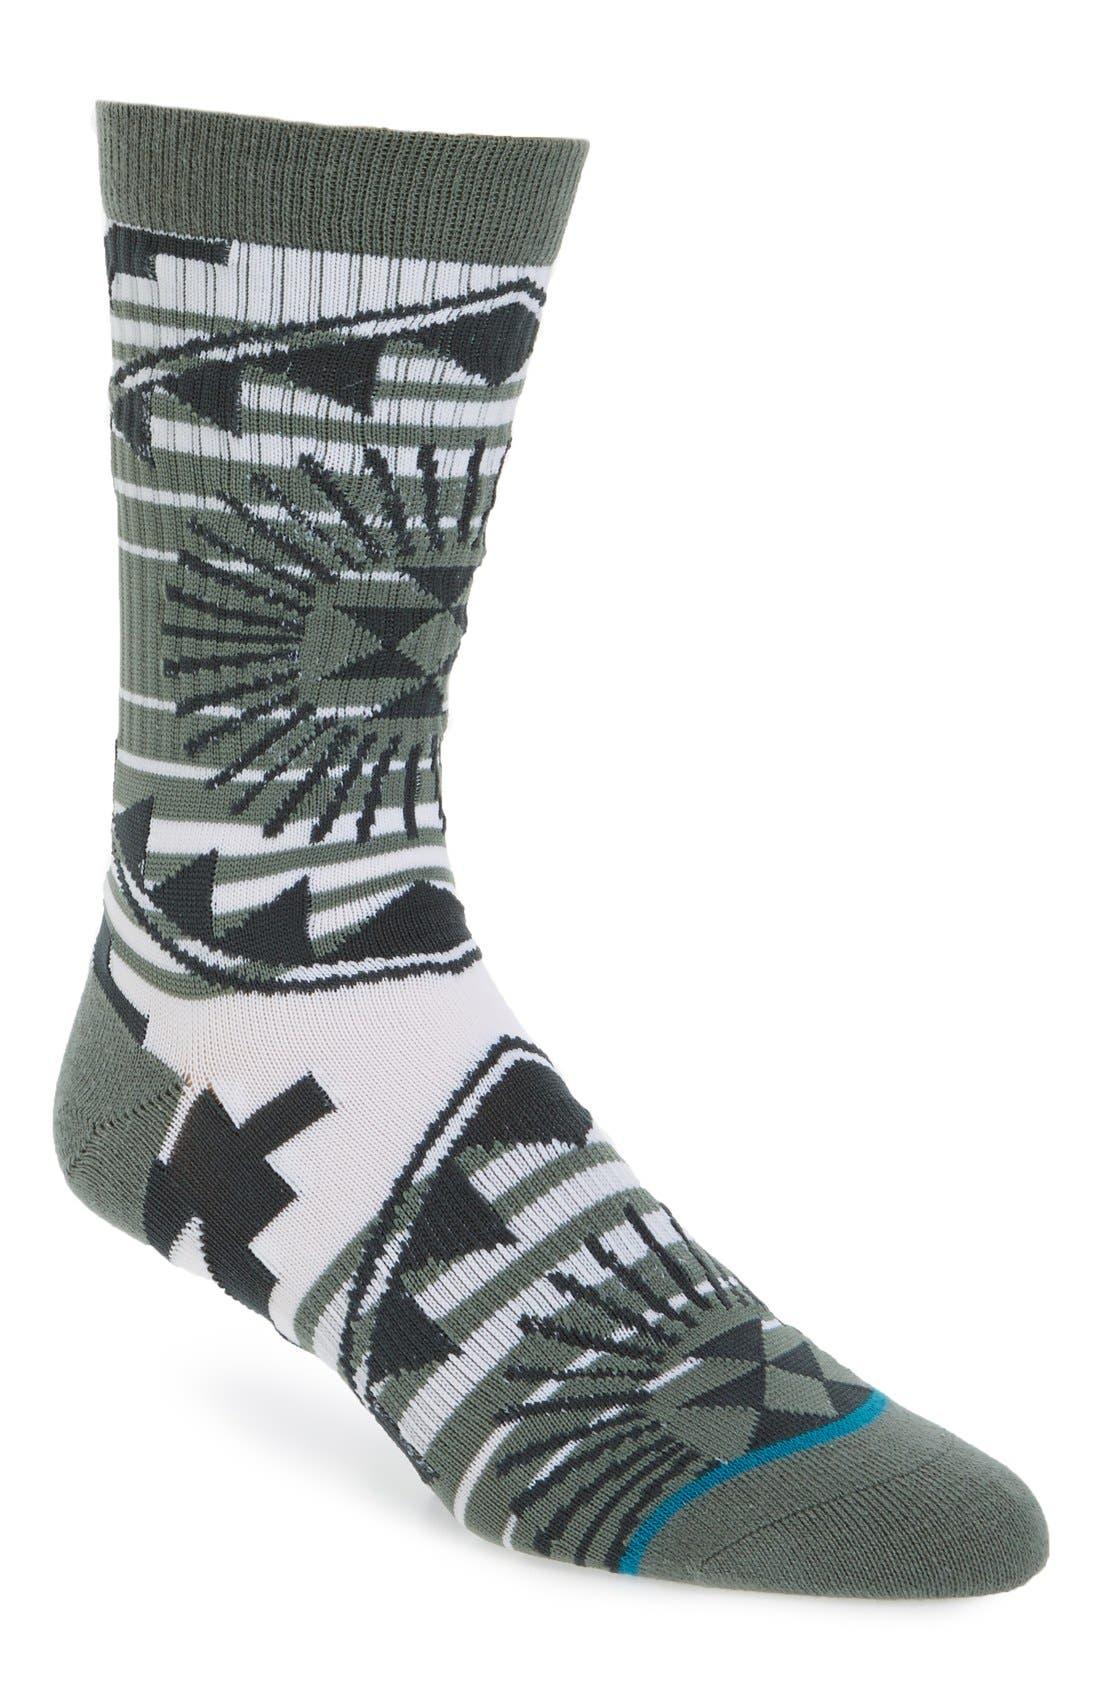 Sundrop 2 Crew Socks,                         Main,                         color, 310